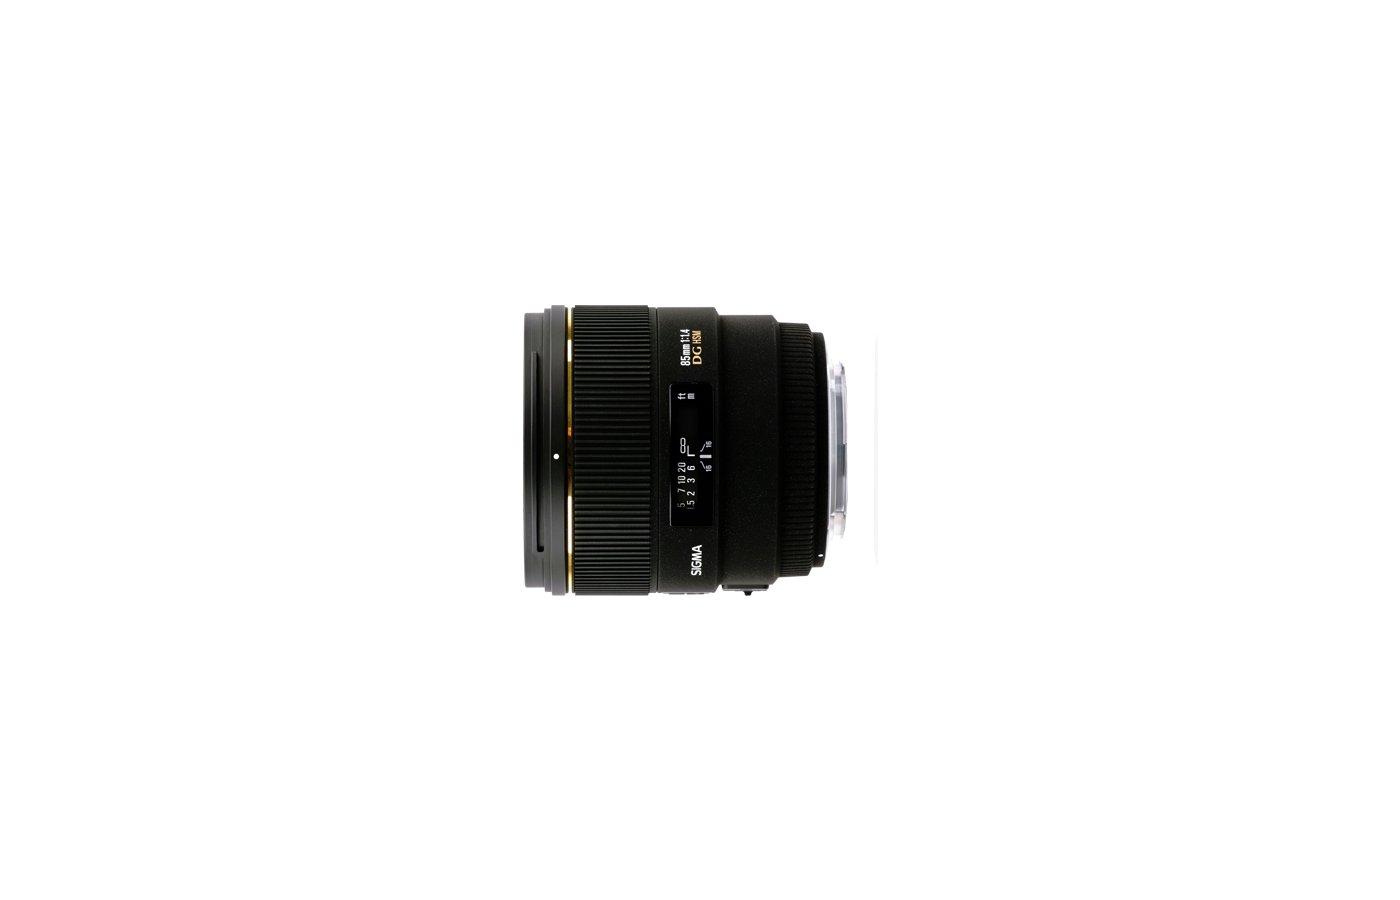 Объектив Sigma AF 85mm f/1.4 EX DG HSM для NIKON